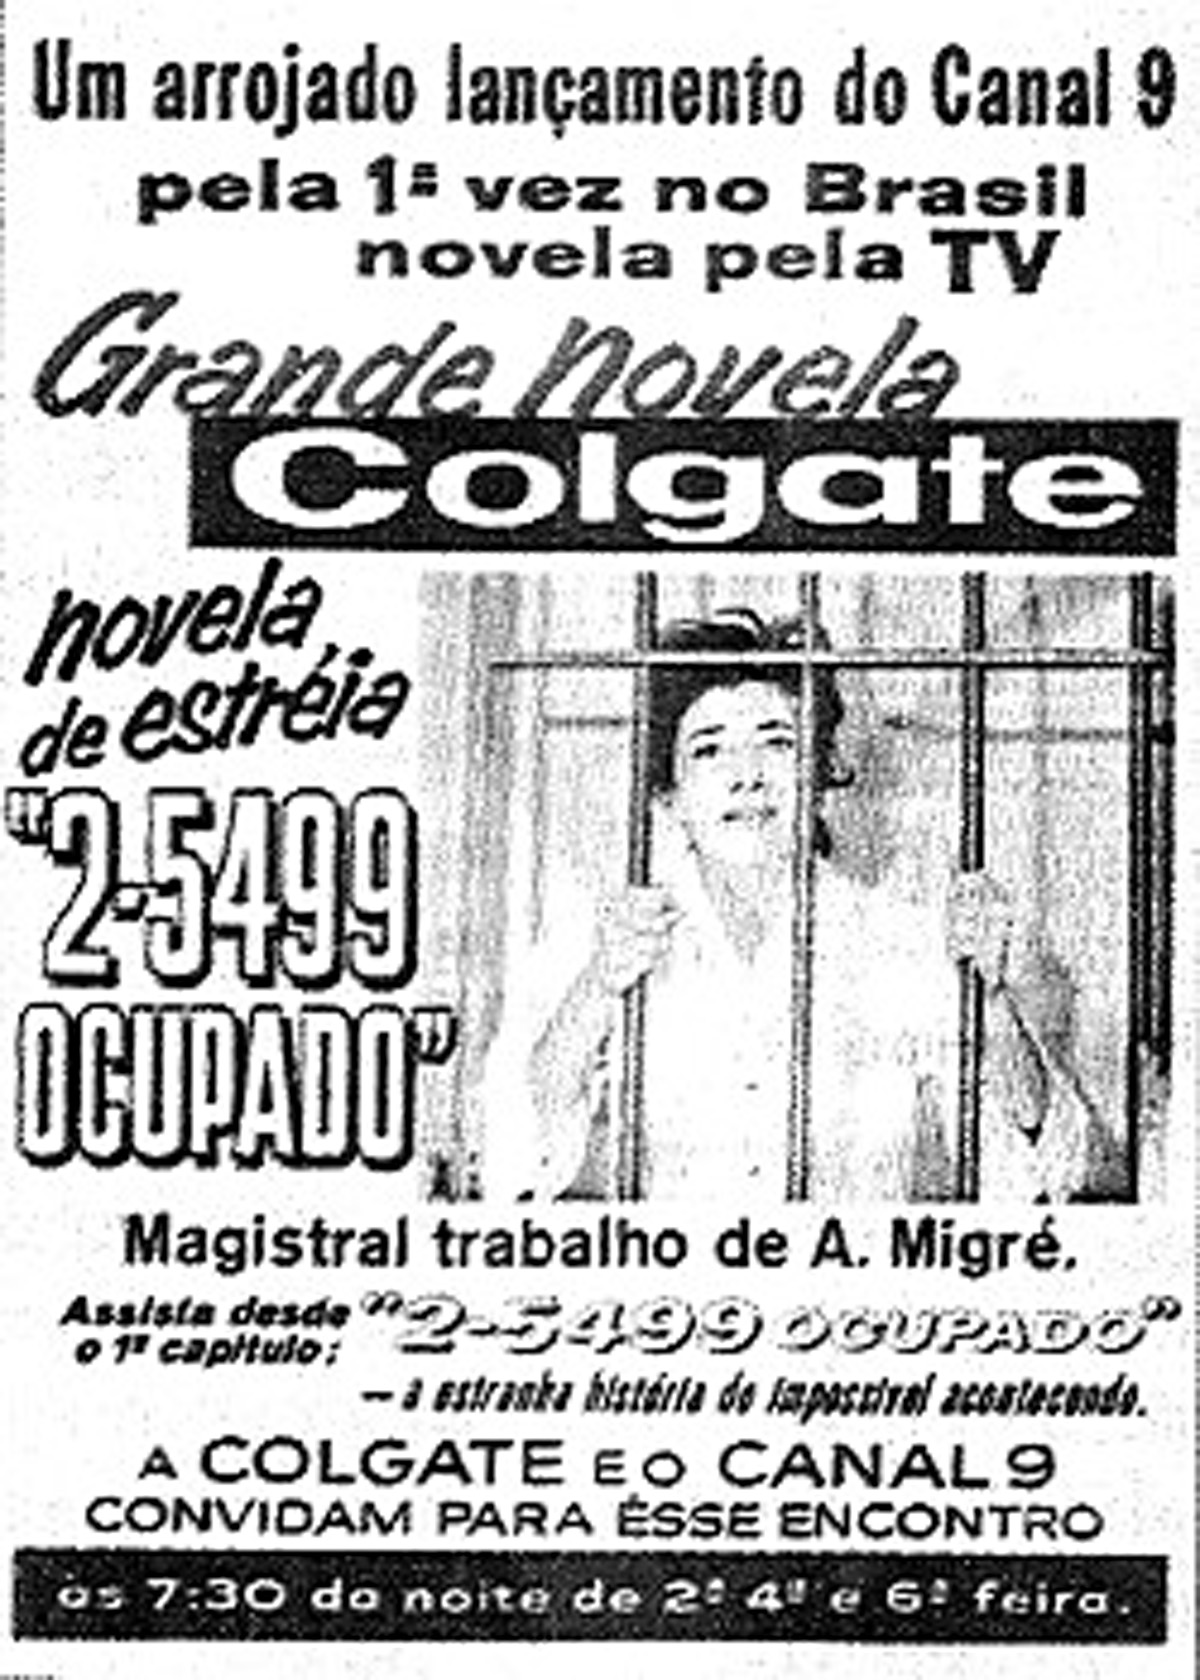 Propaganda da 1ª novela<a style='float:right' href='https://www3.al.sp.gov.br/repositorio/noticia/09-2010/25499ocupado.jpg' target=_blank><img src='/_img/material-file-download-white.png' width='14px' alt='Clique para baixar a imagem'></a>